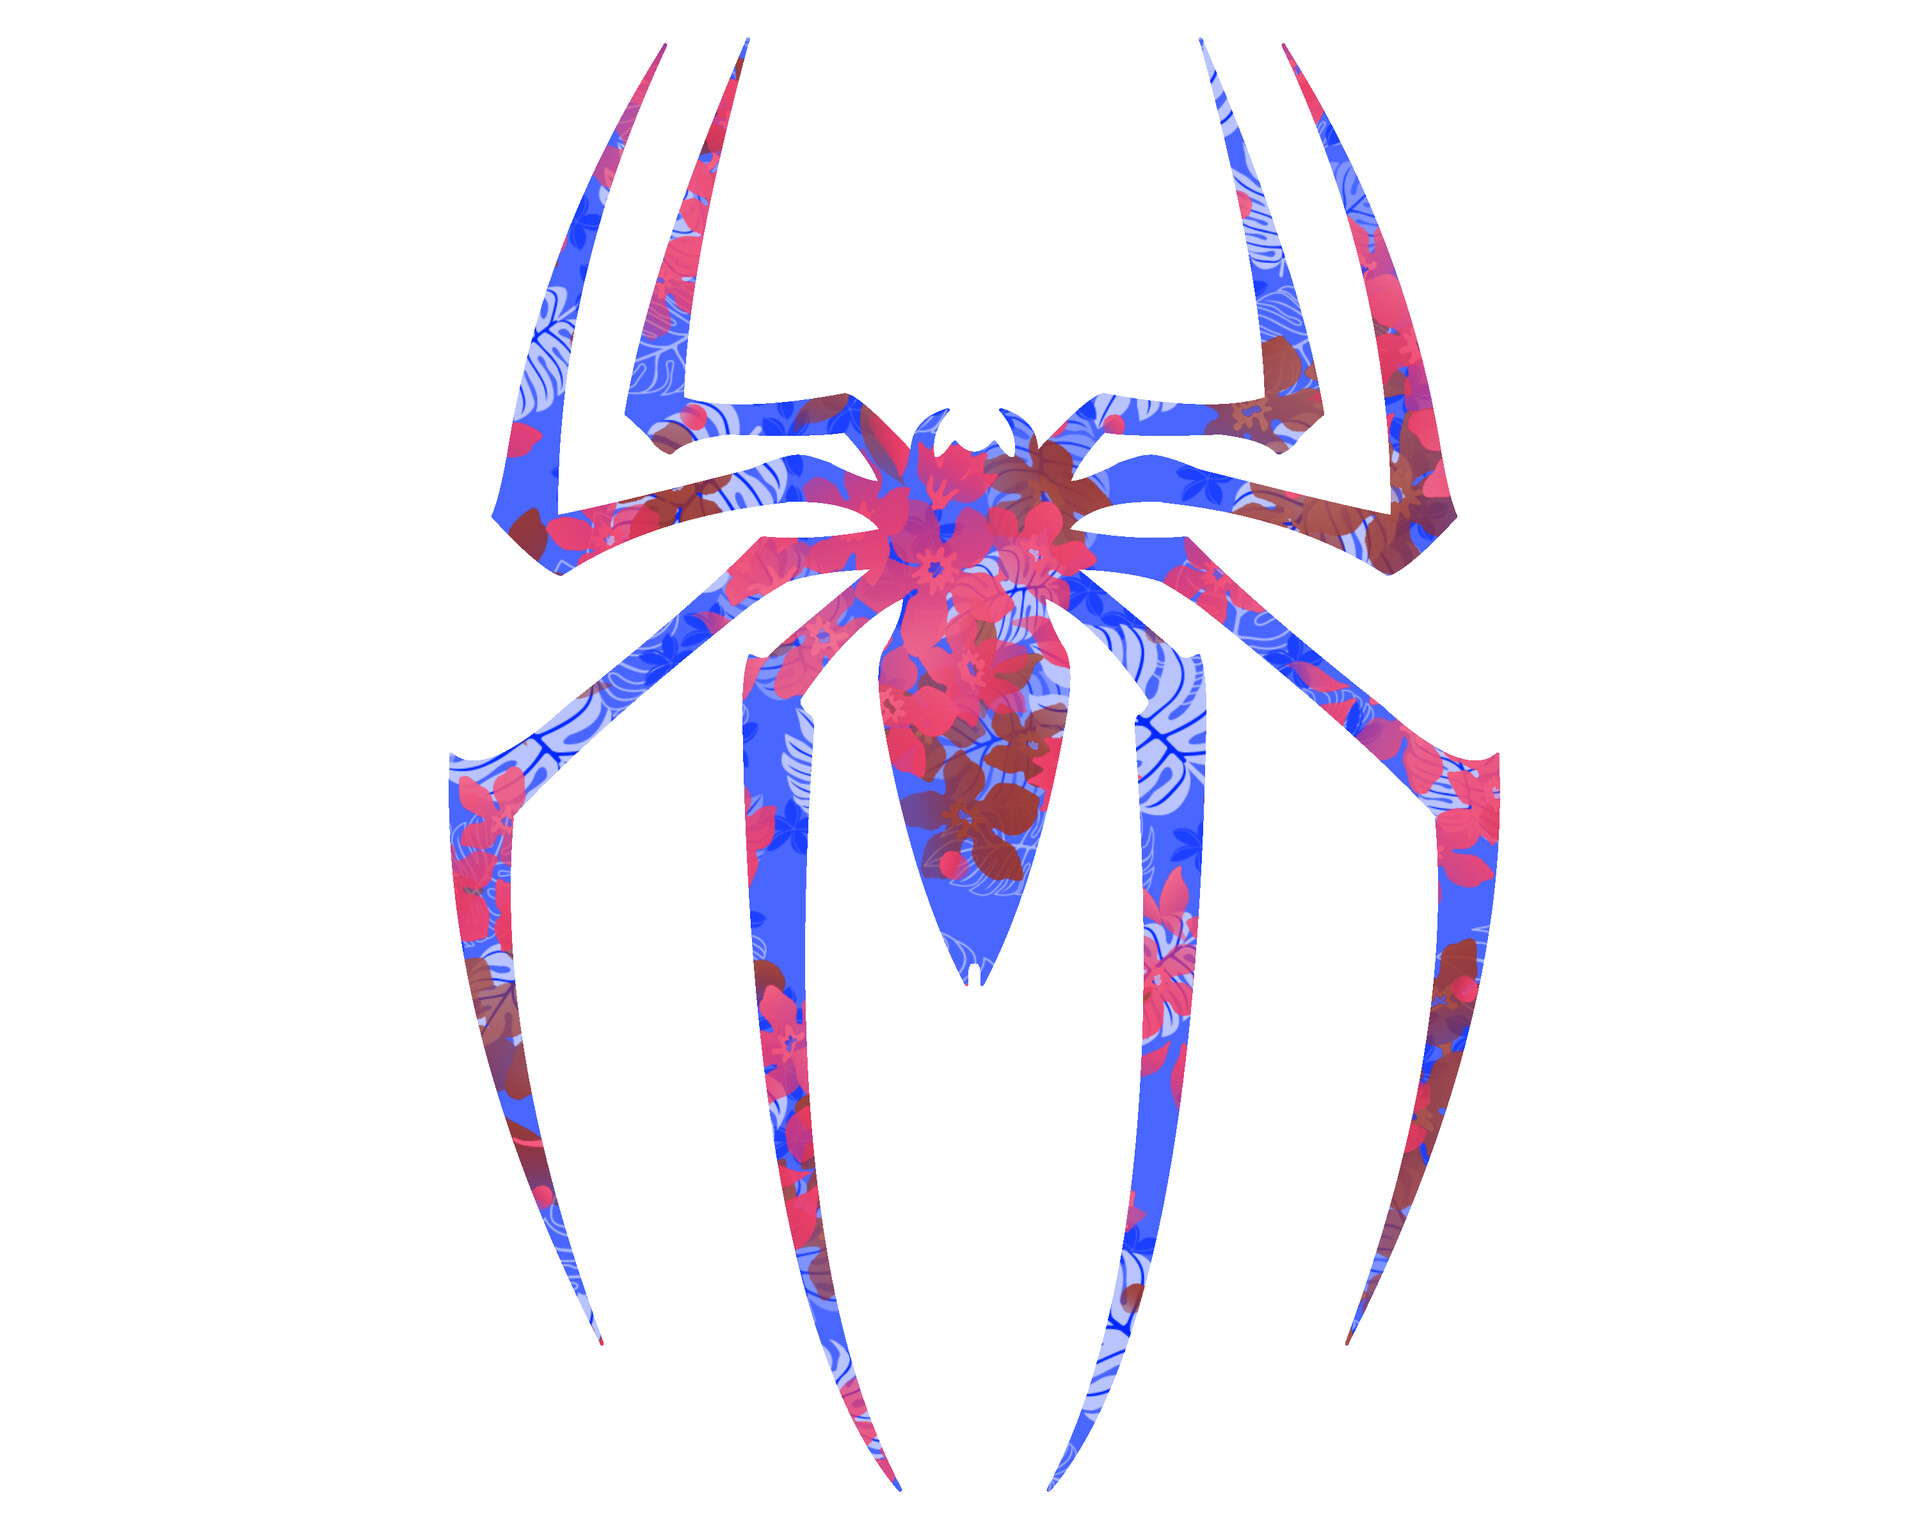 эмблема человека паука картинки карандашом построен века, подведен